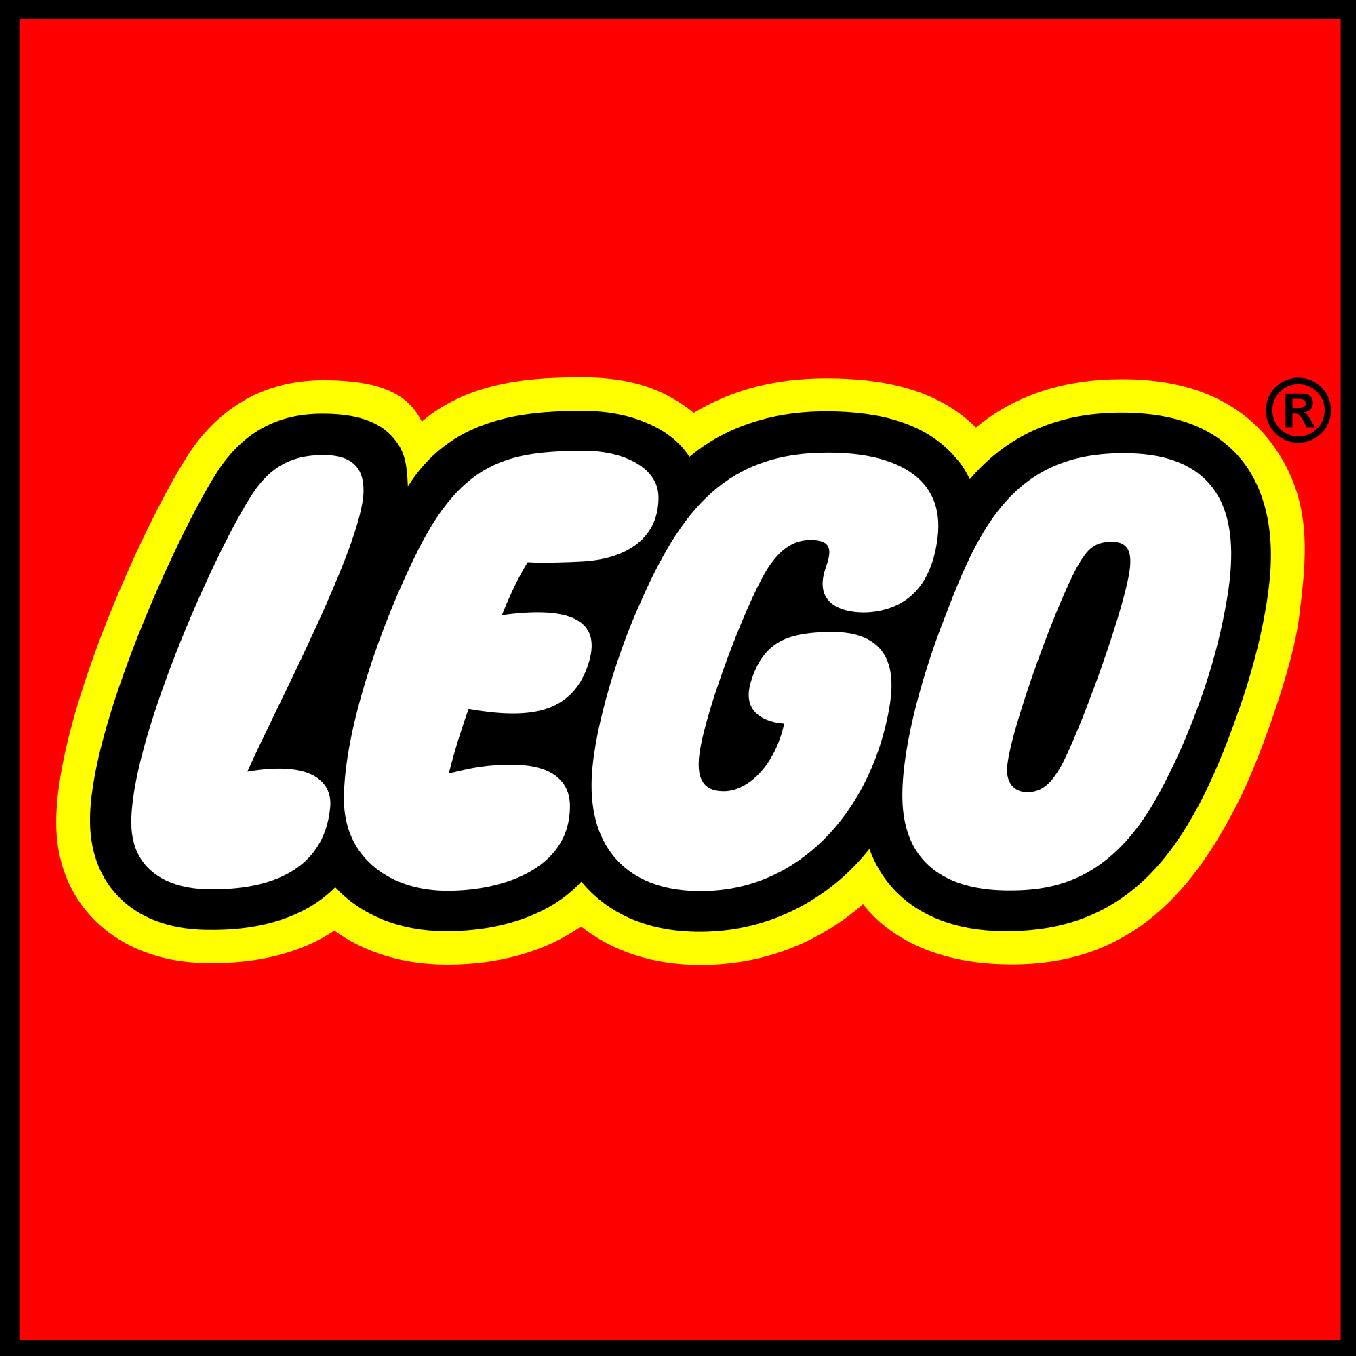 Lego logo wallpapers HD